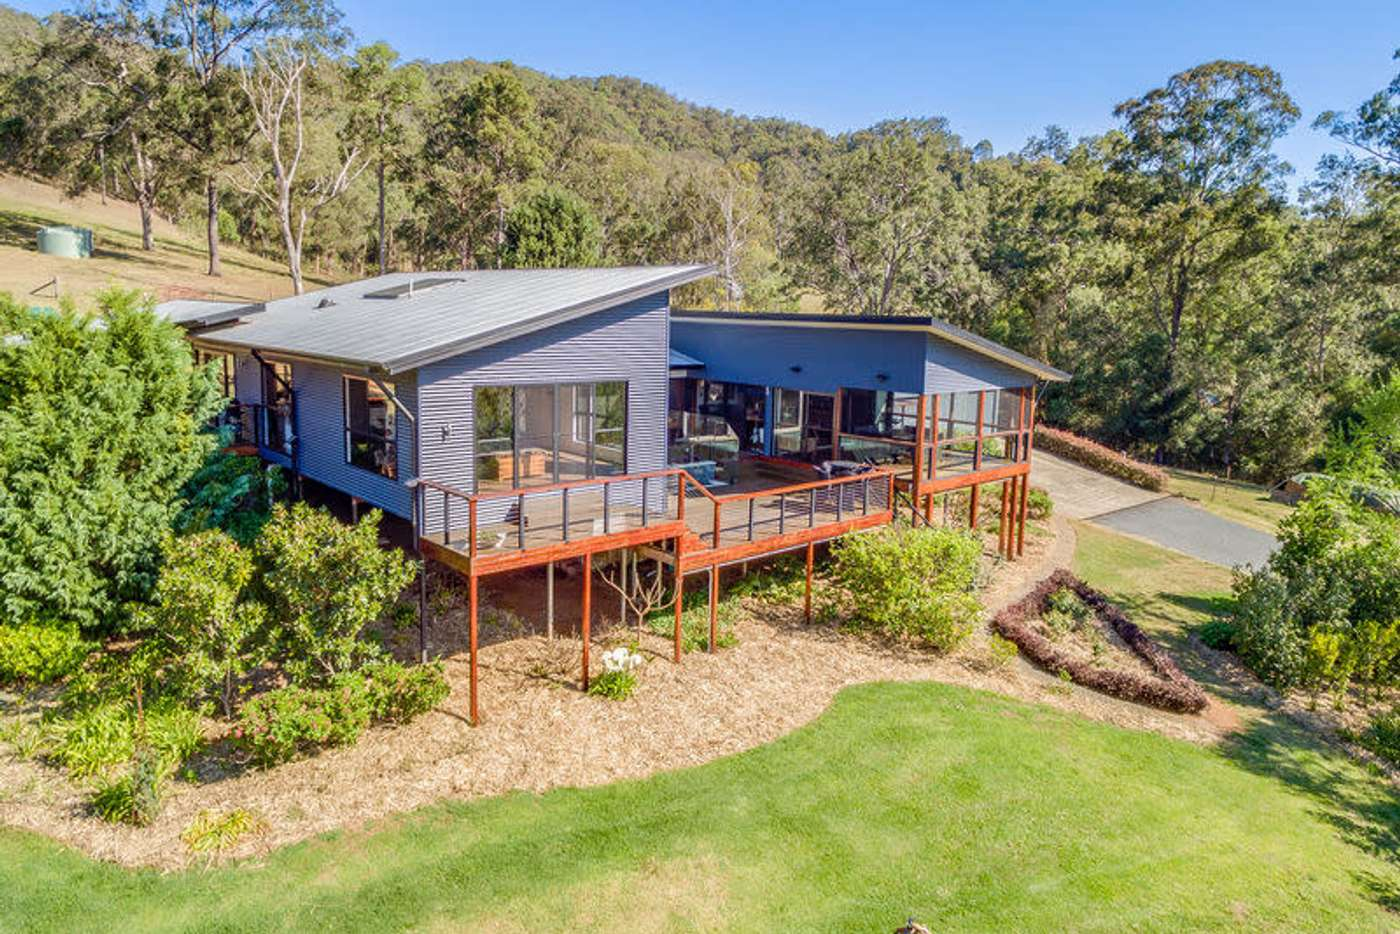 Main view of Homely acreageSemiRural listing, 47 Tucker Lane, Ferny Glen QLD 4275